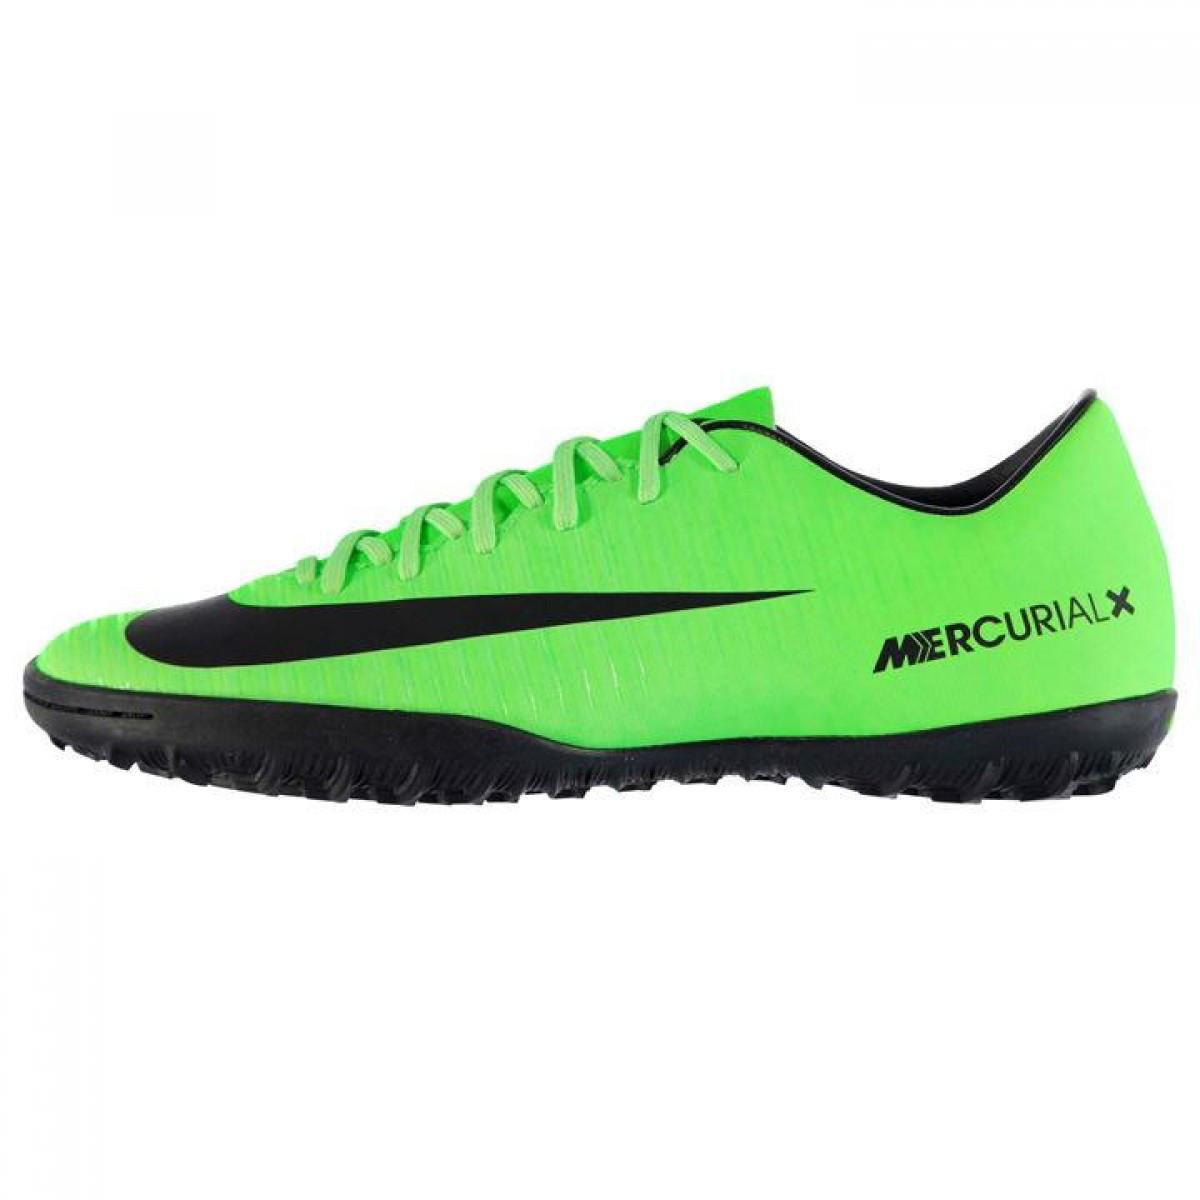 7b727864 Бутсы Nike Mercurial Victory Green/Black - Оригинал - FAIR - оригинальная  одежда и обувь